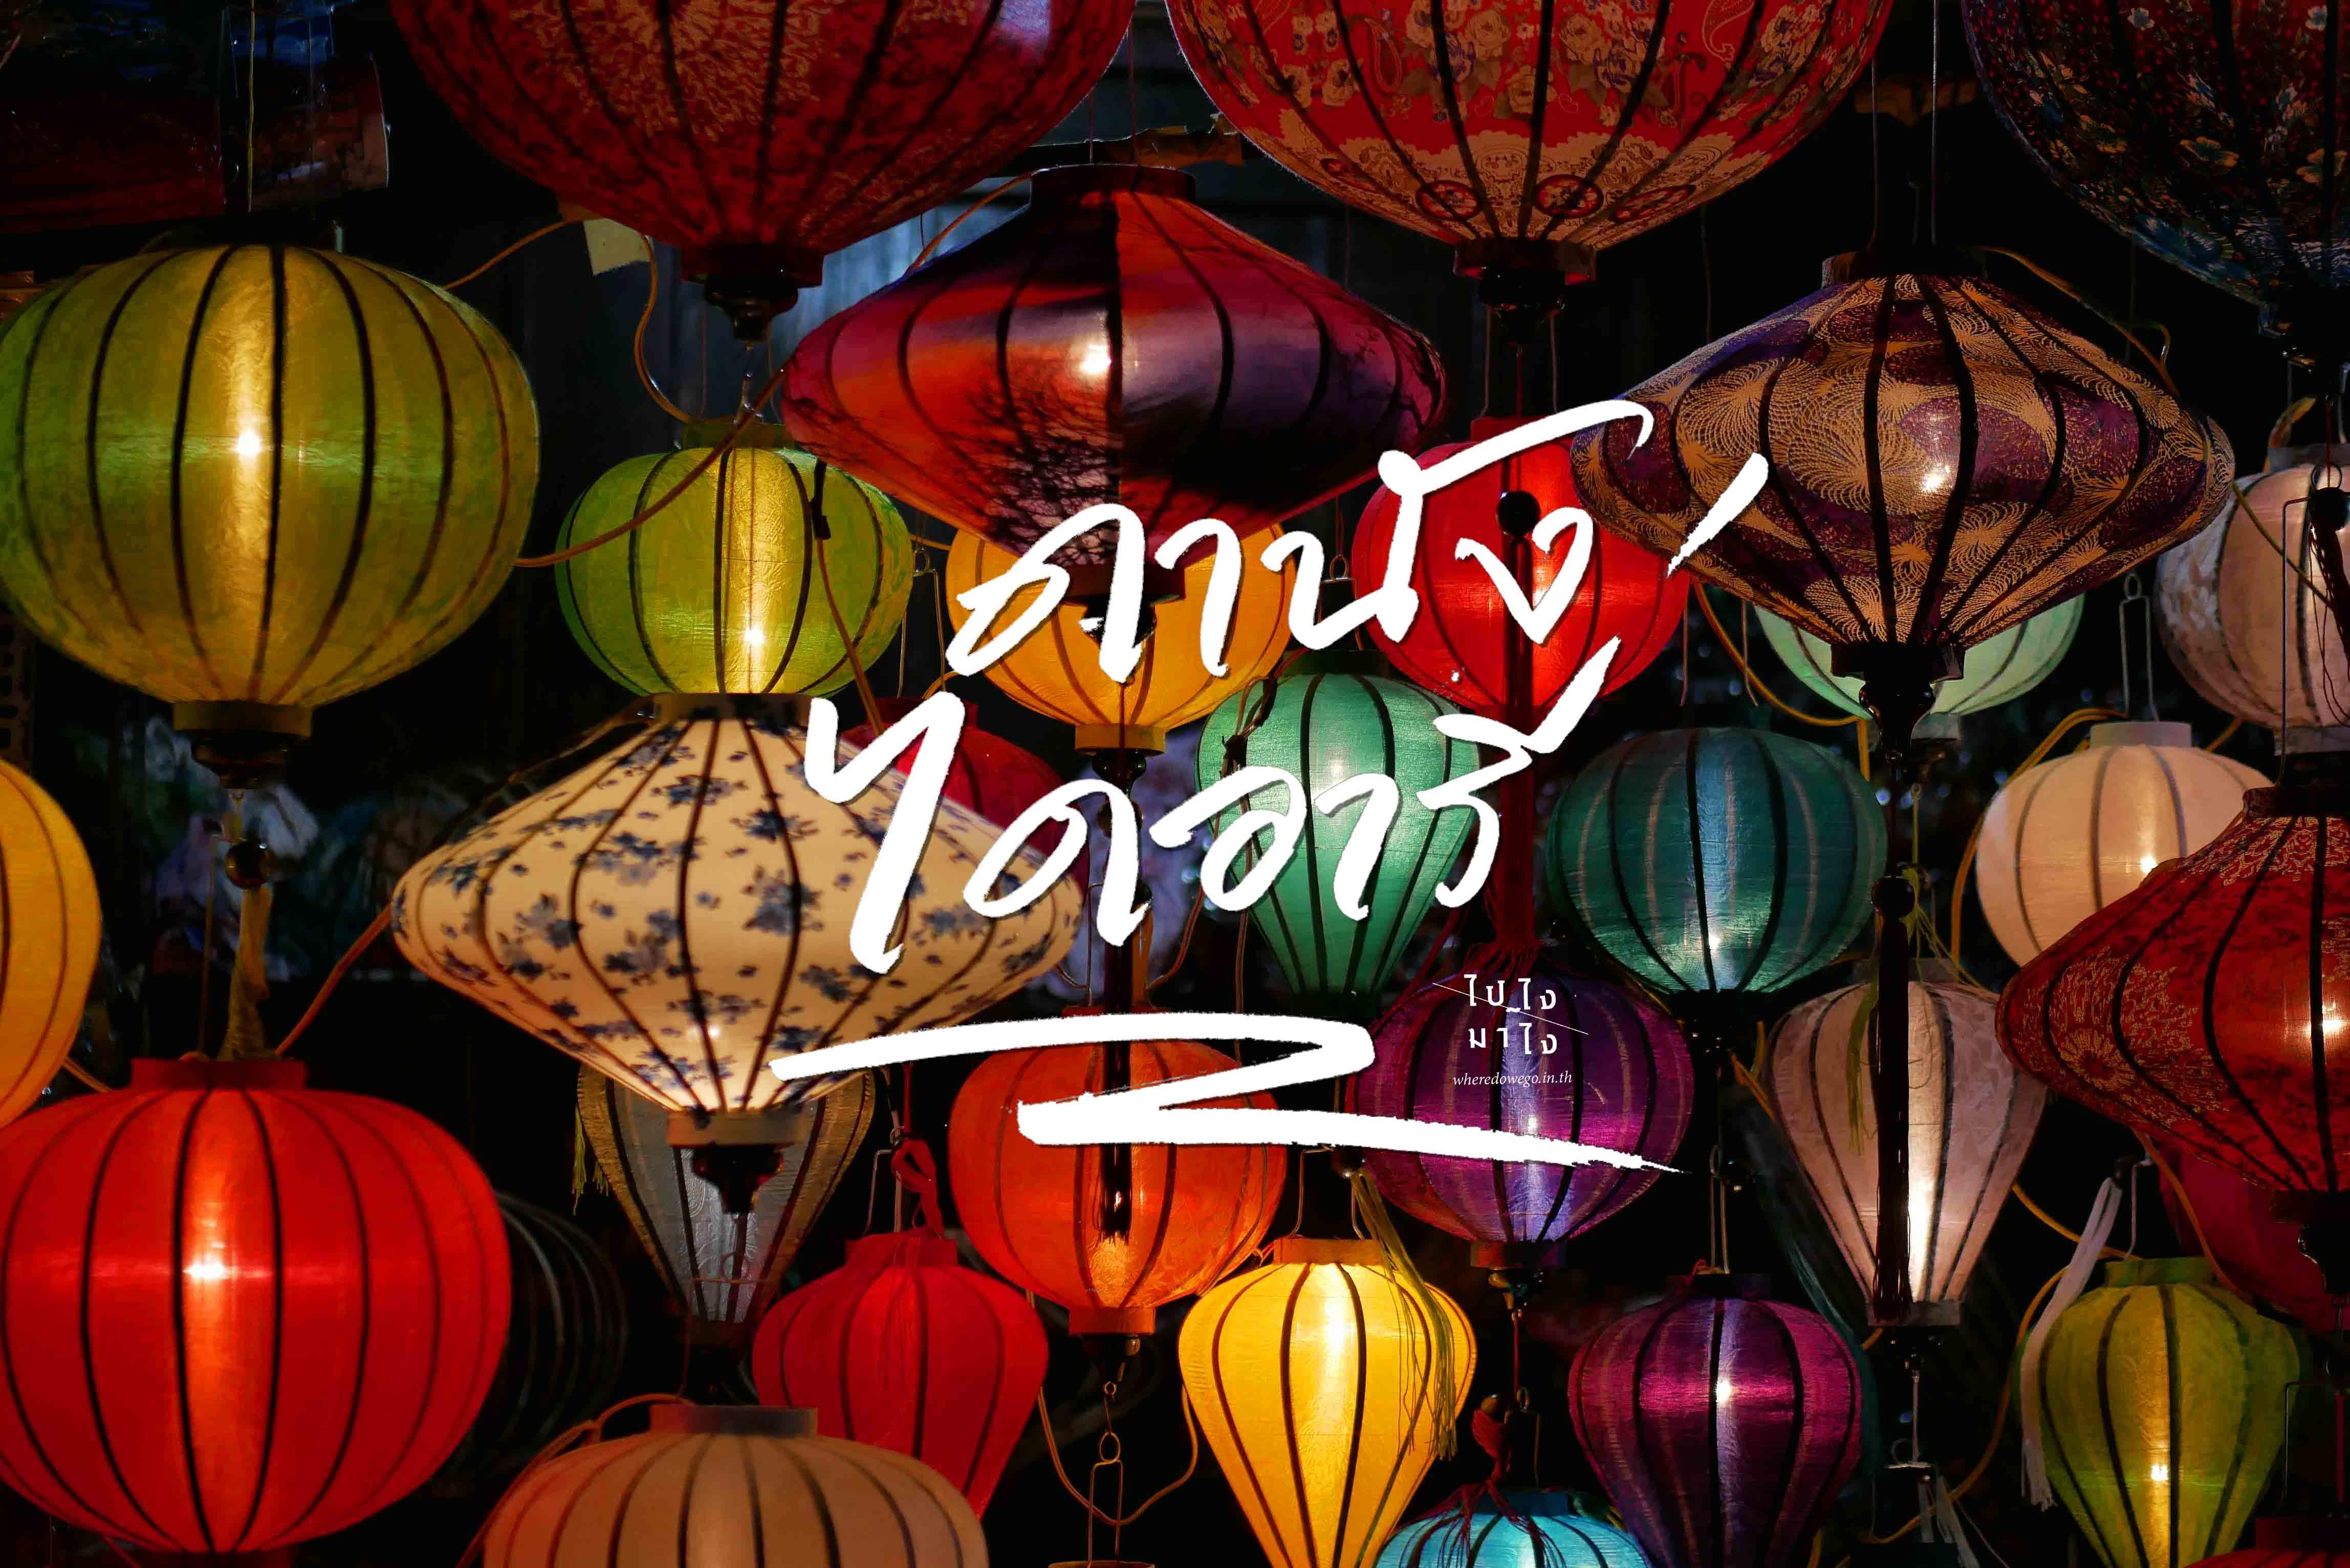 Danang Diary เวียดนามแบบน่ารักๆ จนนึกว่าเดินอยู่ยุโรป